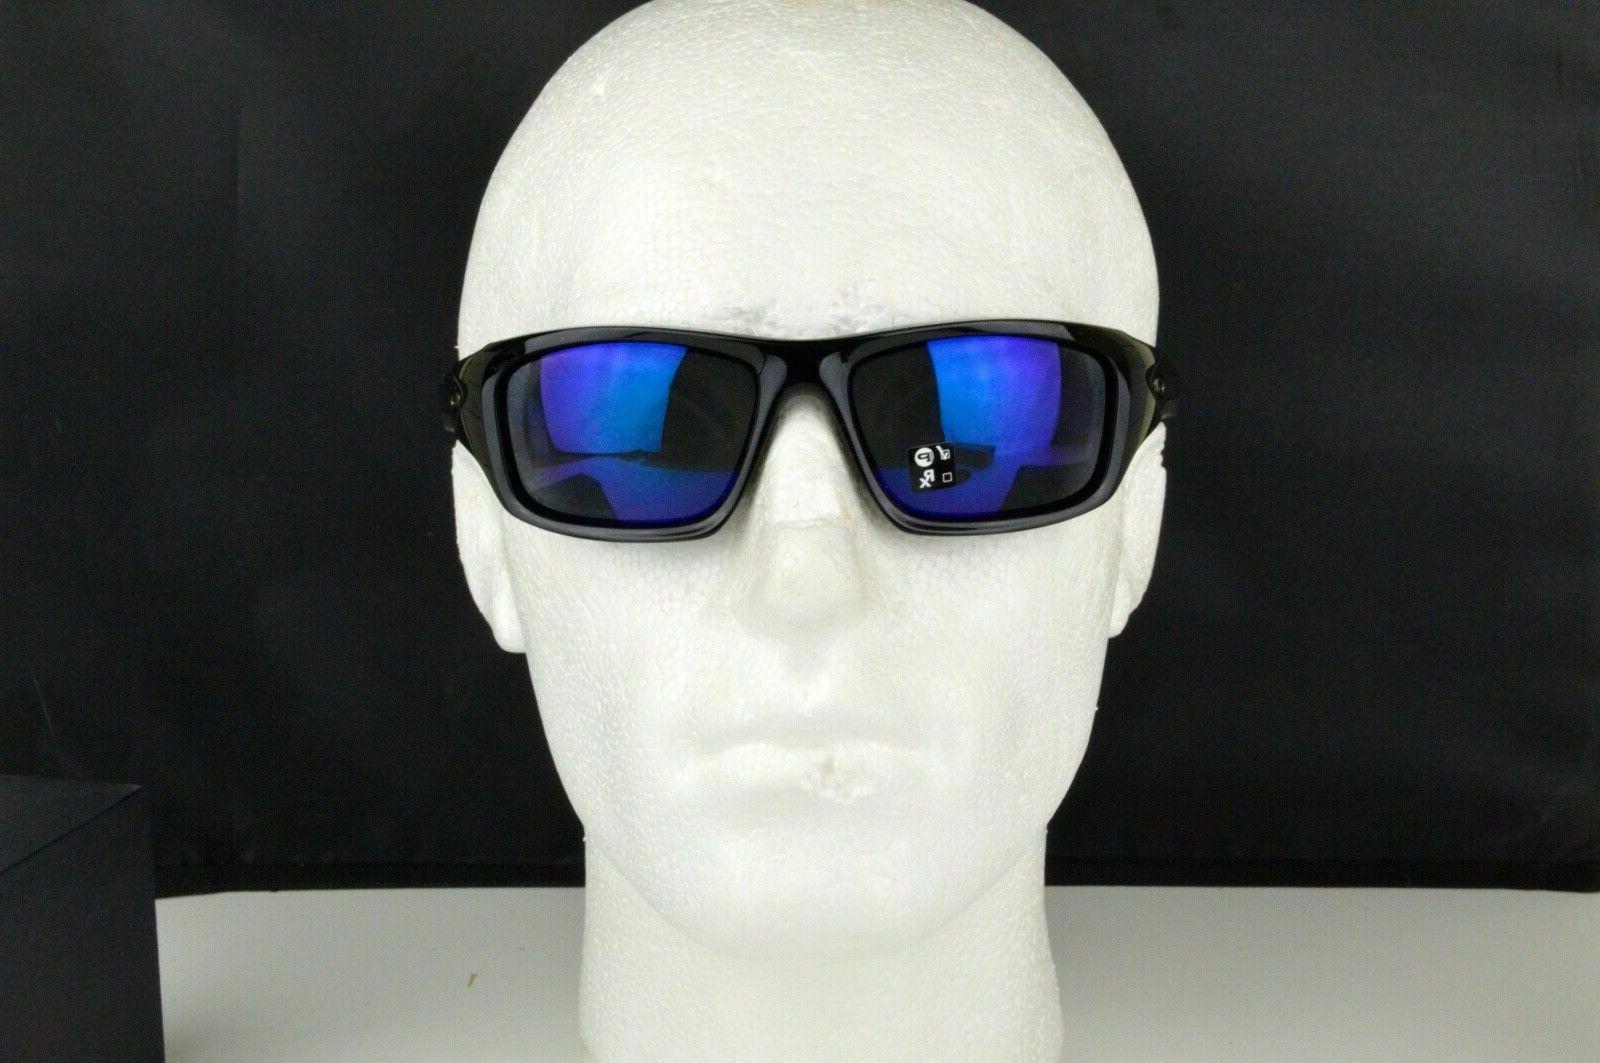 Oakley OO9236-07 W/ Fire Iridium Lens